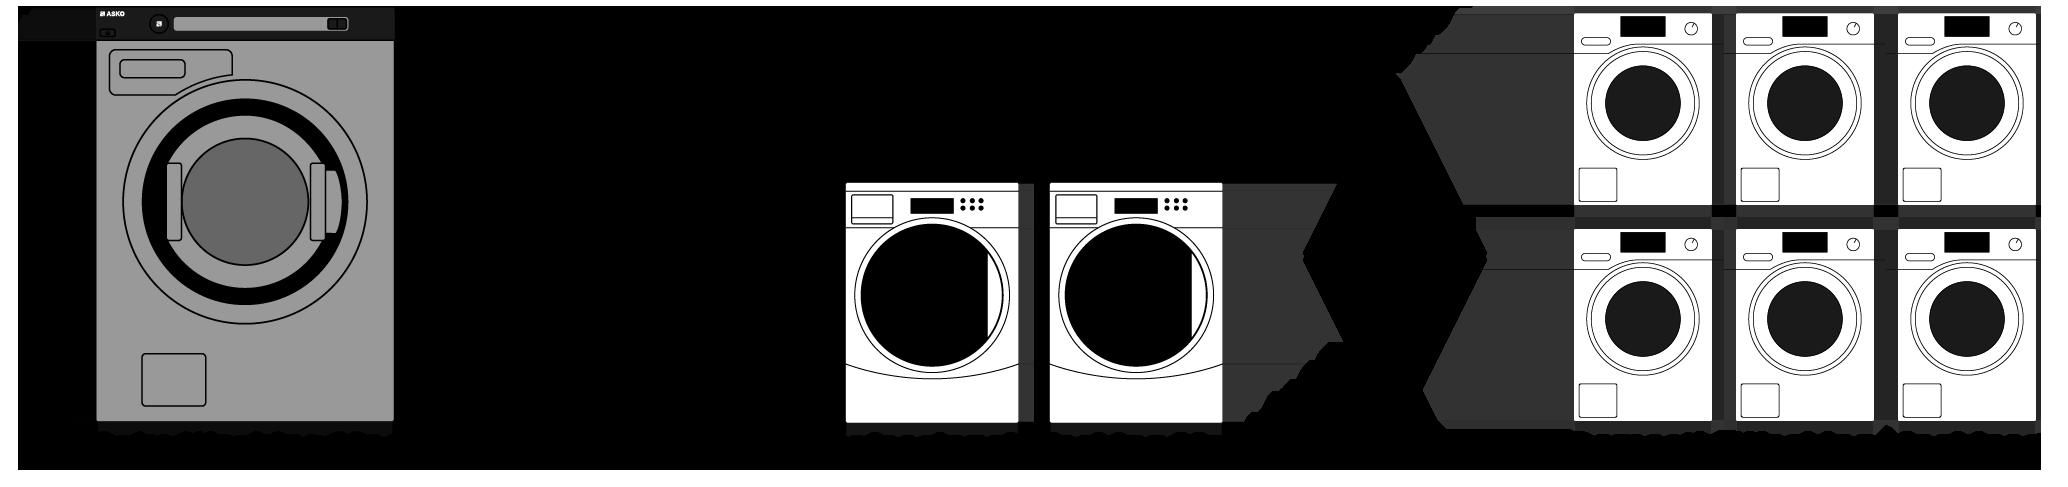 Illustration of usage of washing machines over lifetime